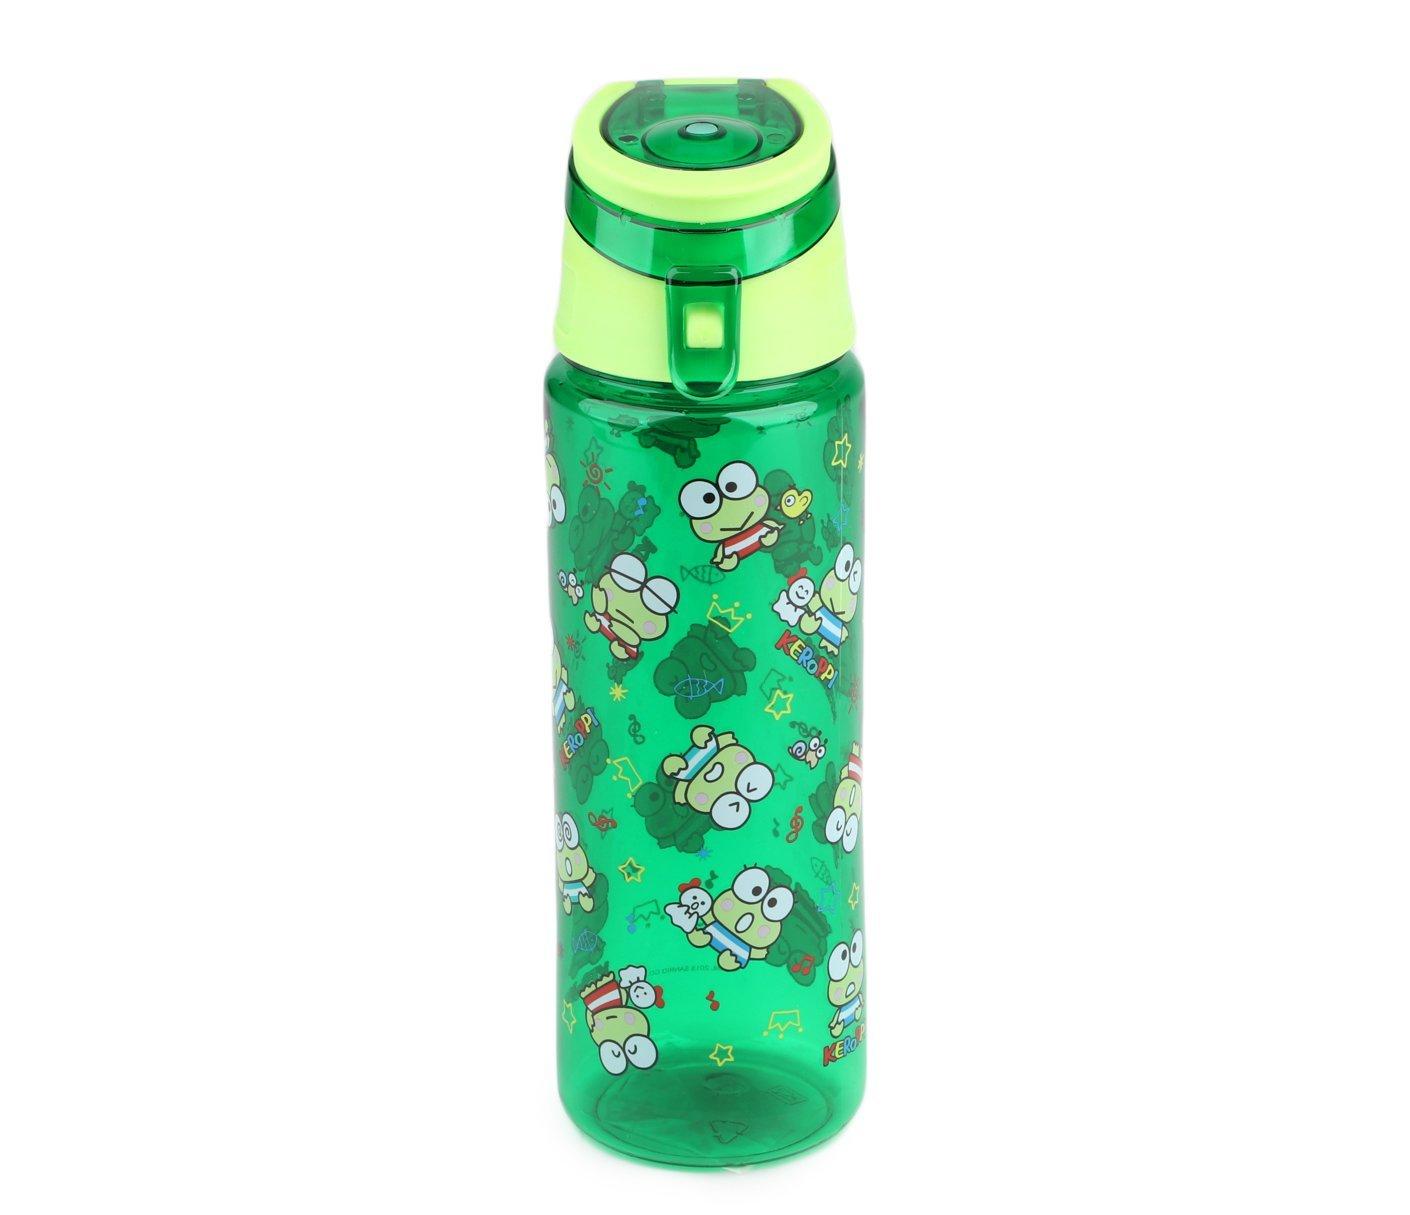 SANRIO Keroppi Water Bottle: Retro Fun